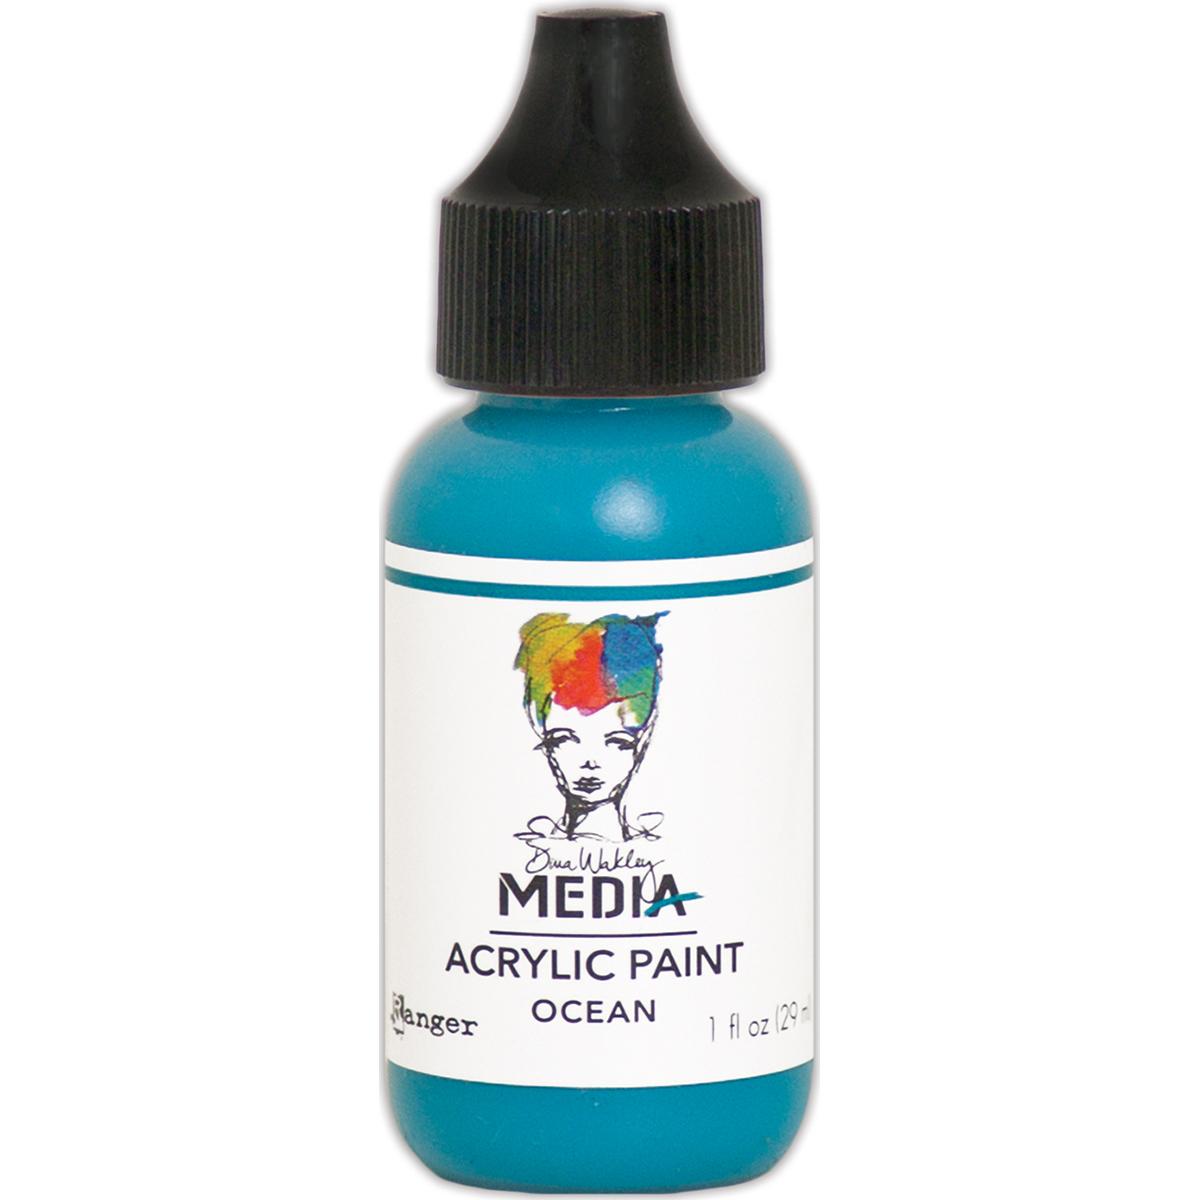 Dina Wakley Media Acrylic Paint 1oz-Ocean